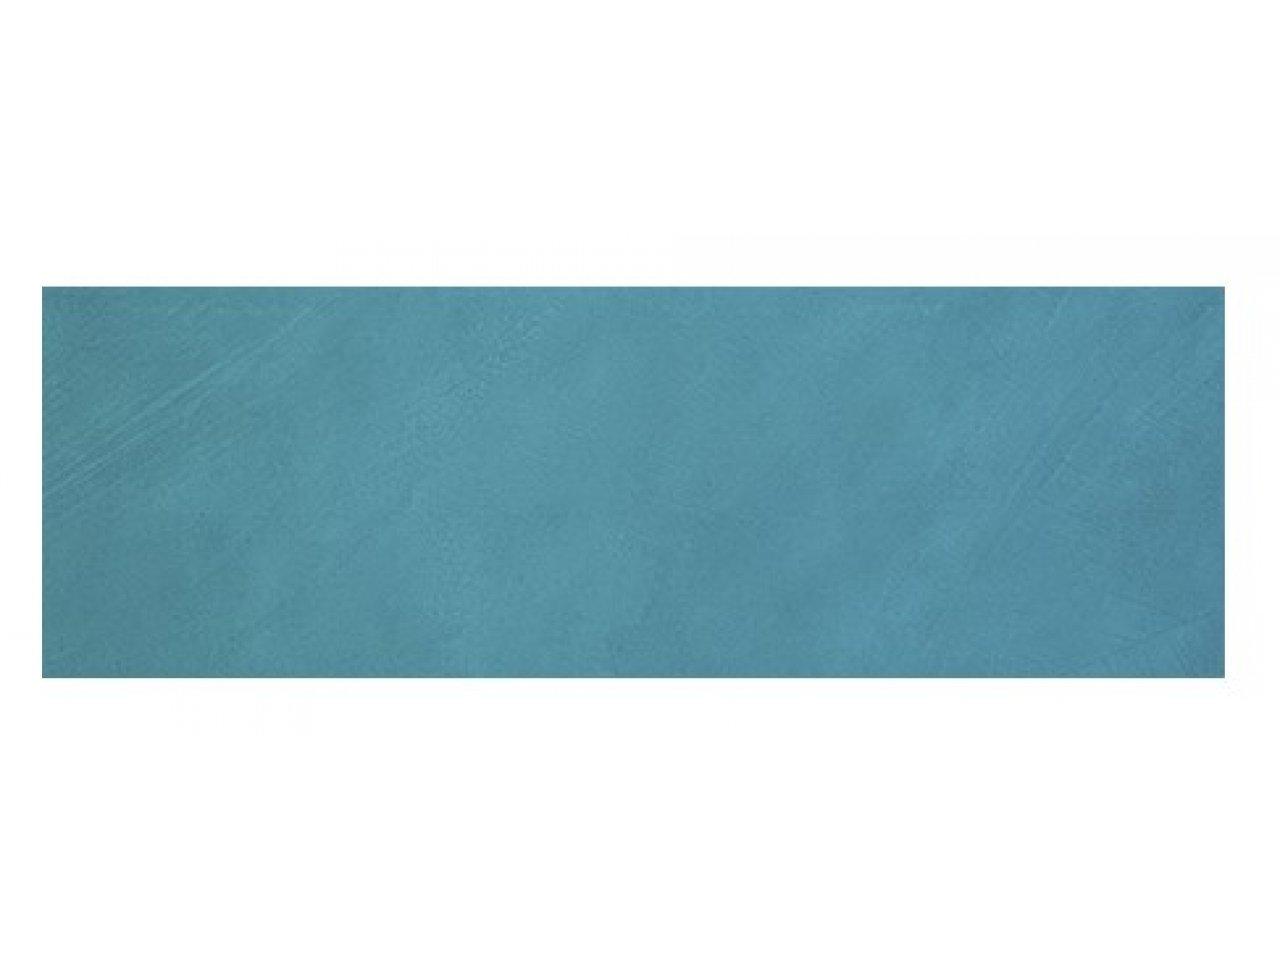 Настенная плитка FAP Color Now Avio 30.5x91.5 см, Арт. fMQR